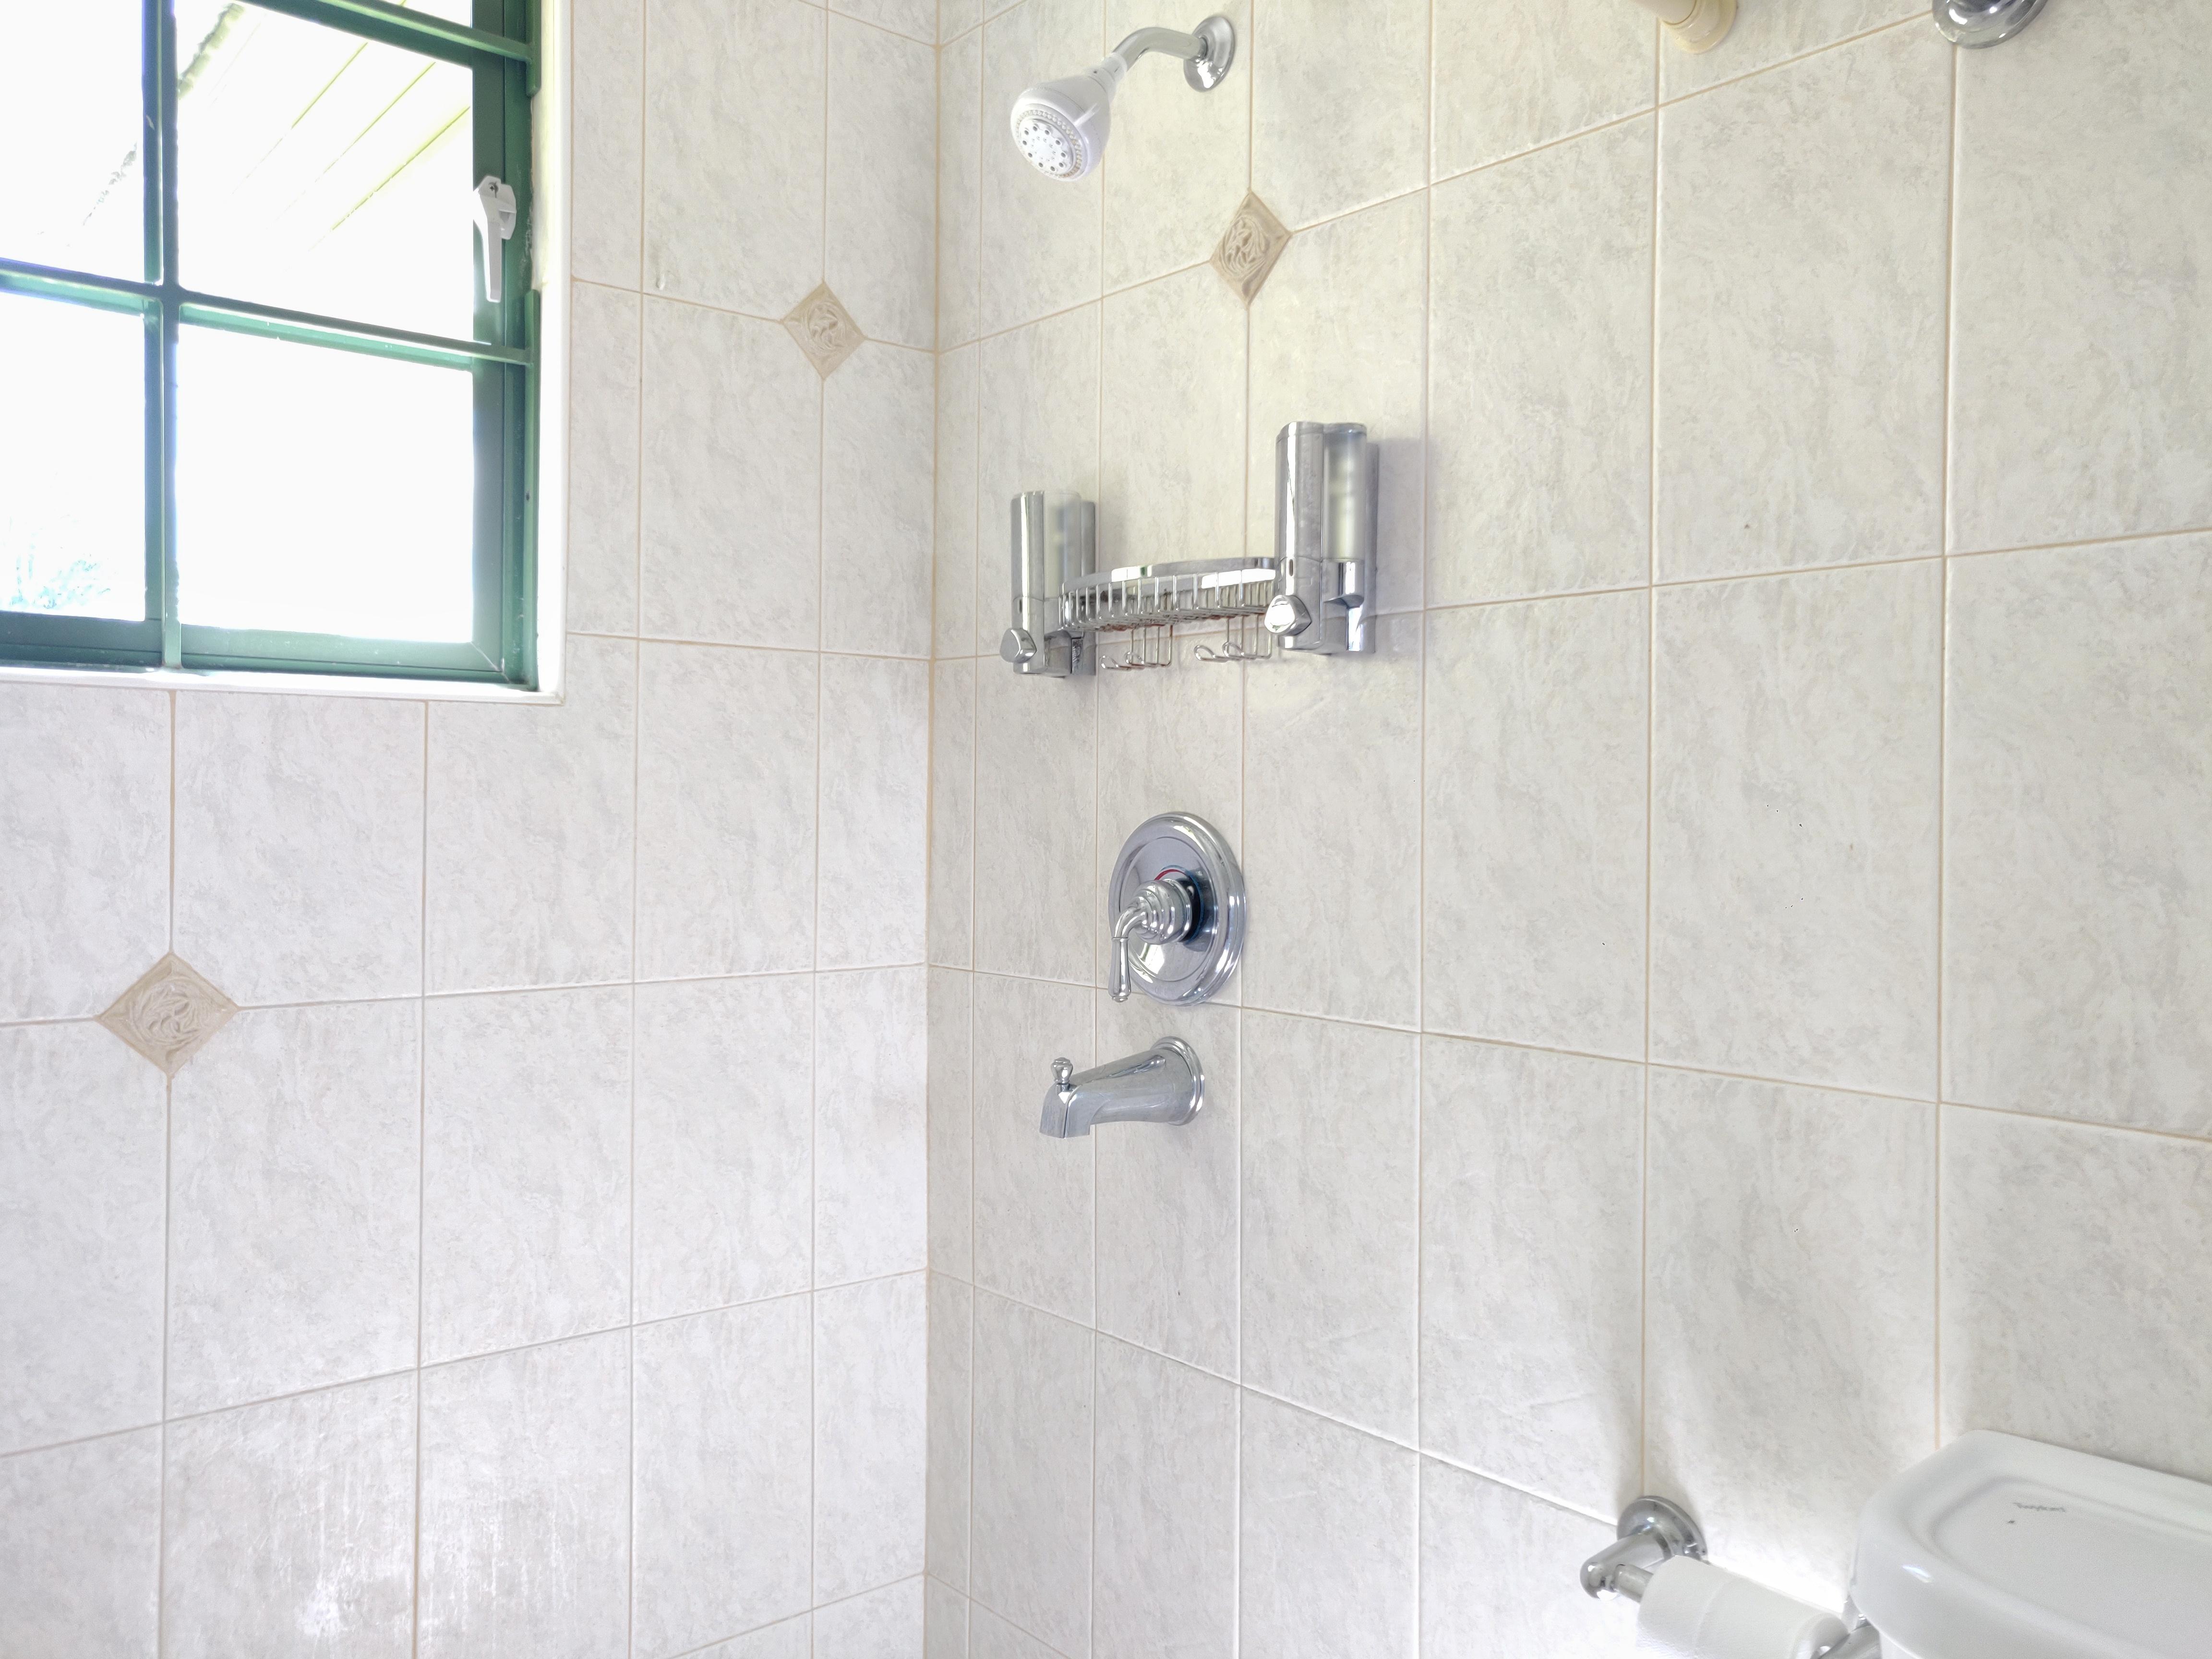 Bathroom, Cane Garden, St. Michael